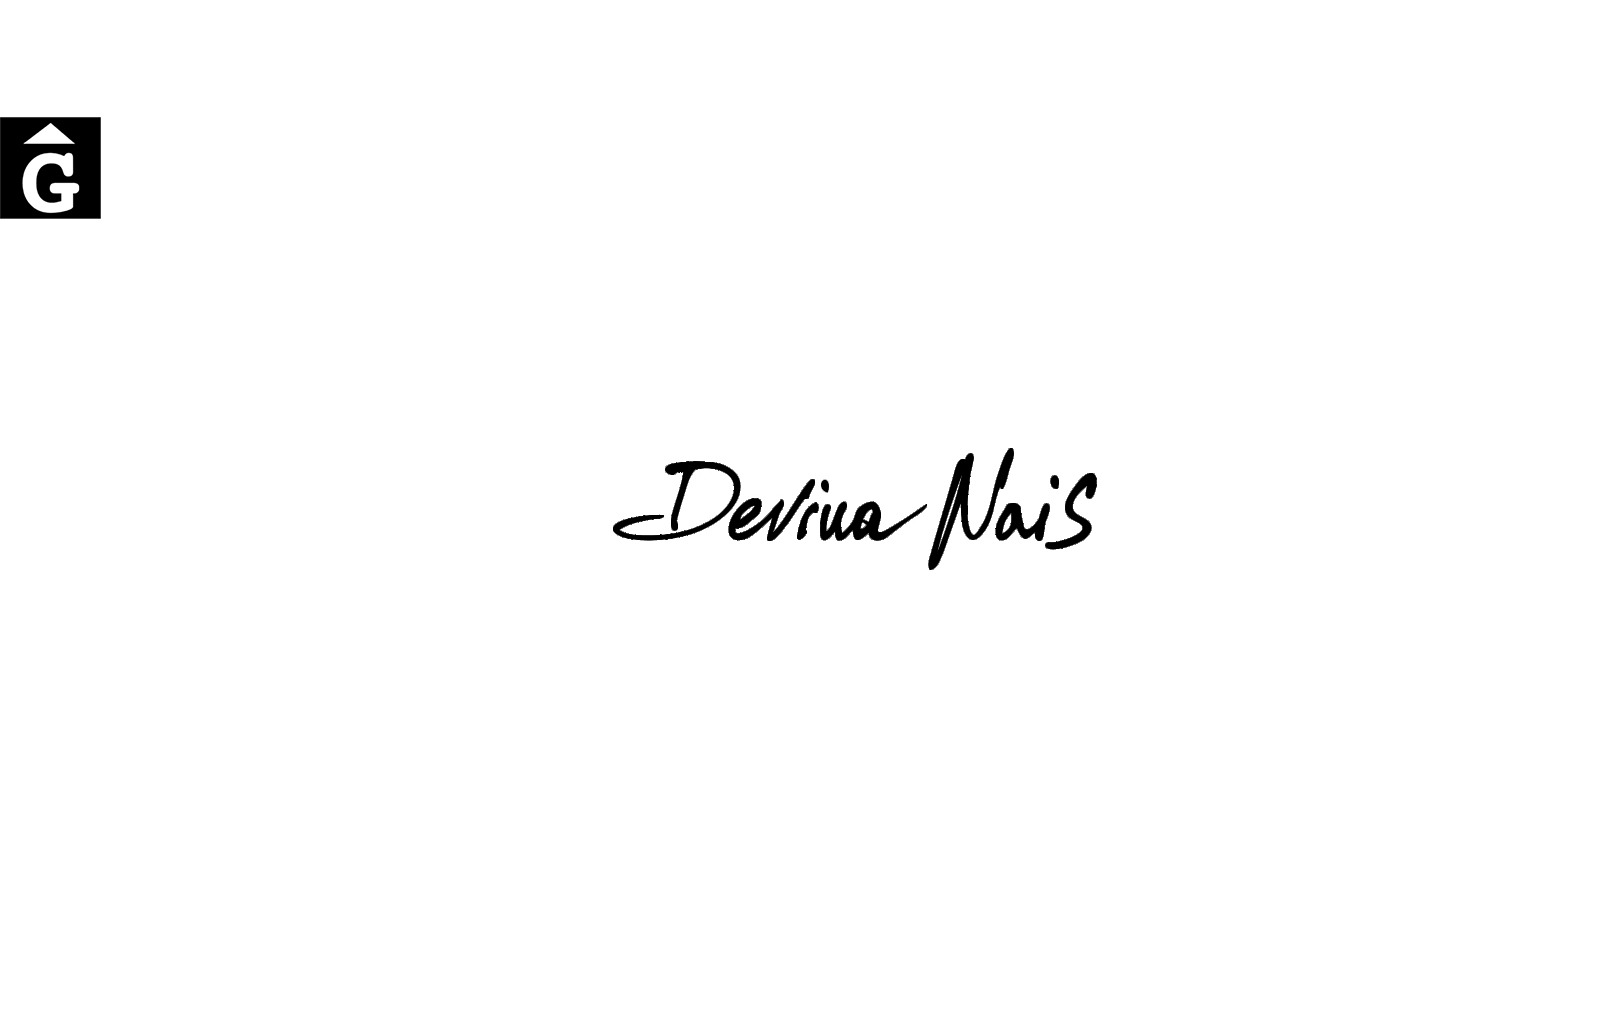 Devina Nais logo Marca mobles Gifreu